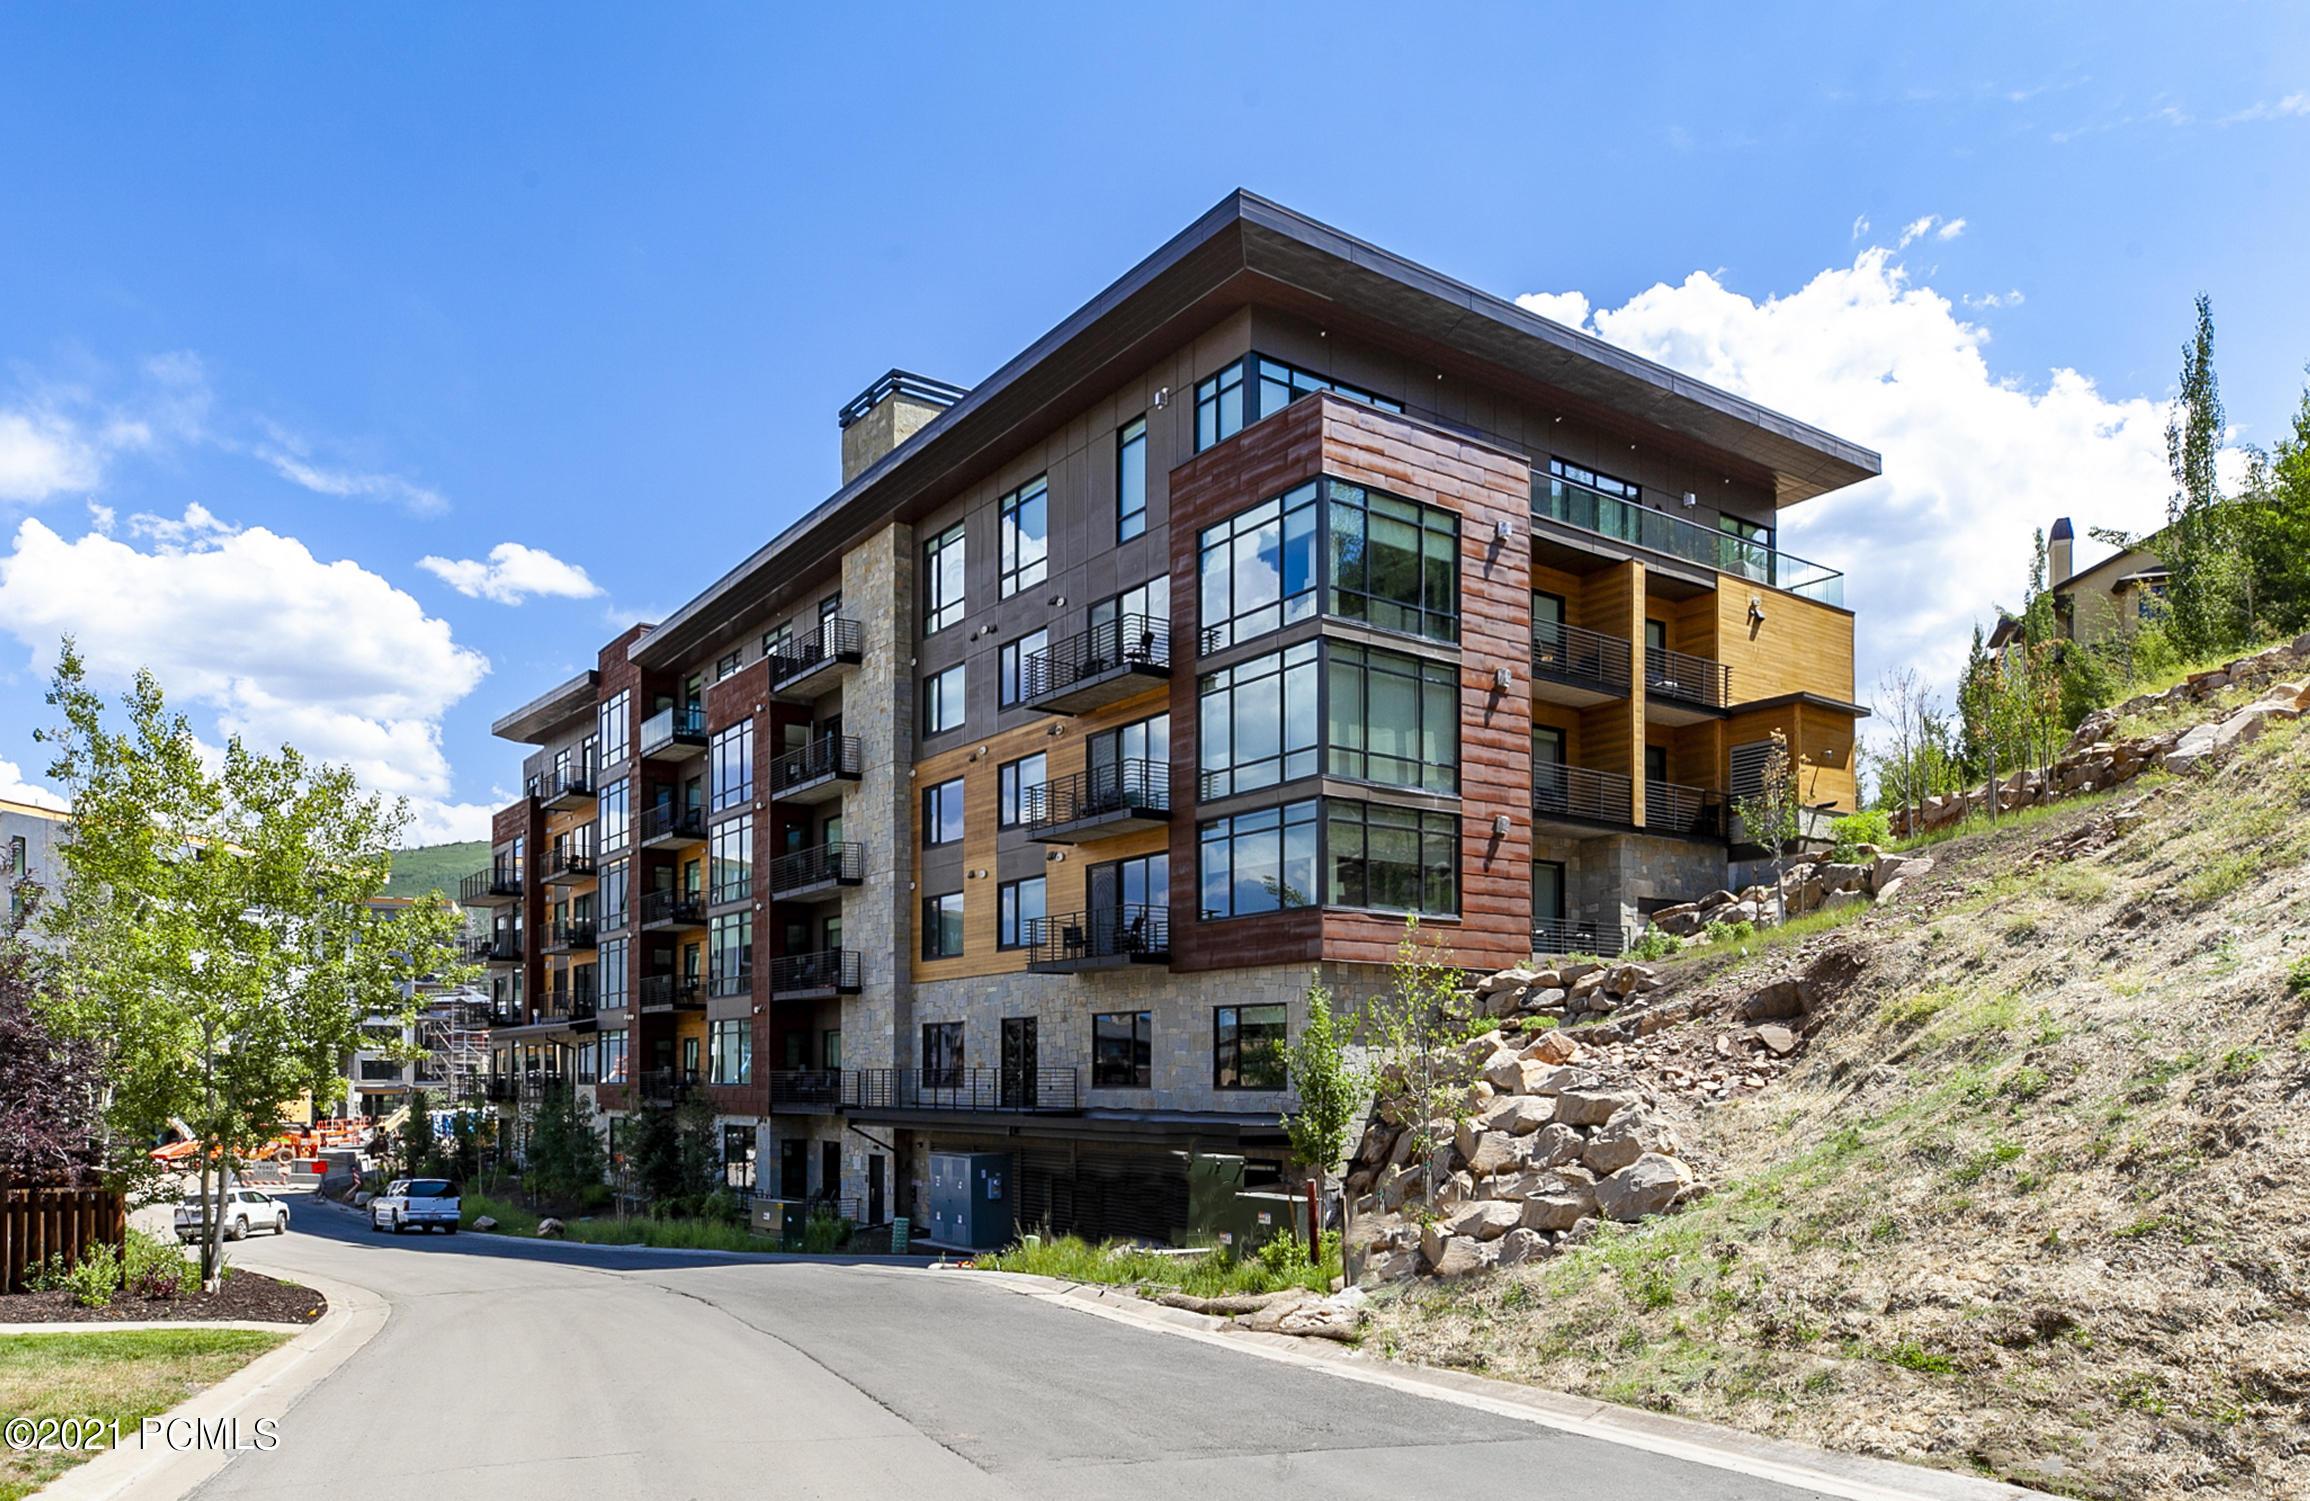 2431 High Mountain Road, Park City, Utah 84098, 4 Bedrooms Bedrooms, ,5 BathroomsBathrooms,Condominium,For Sale,High Mountain,12102900